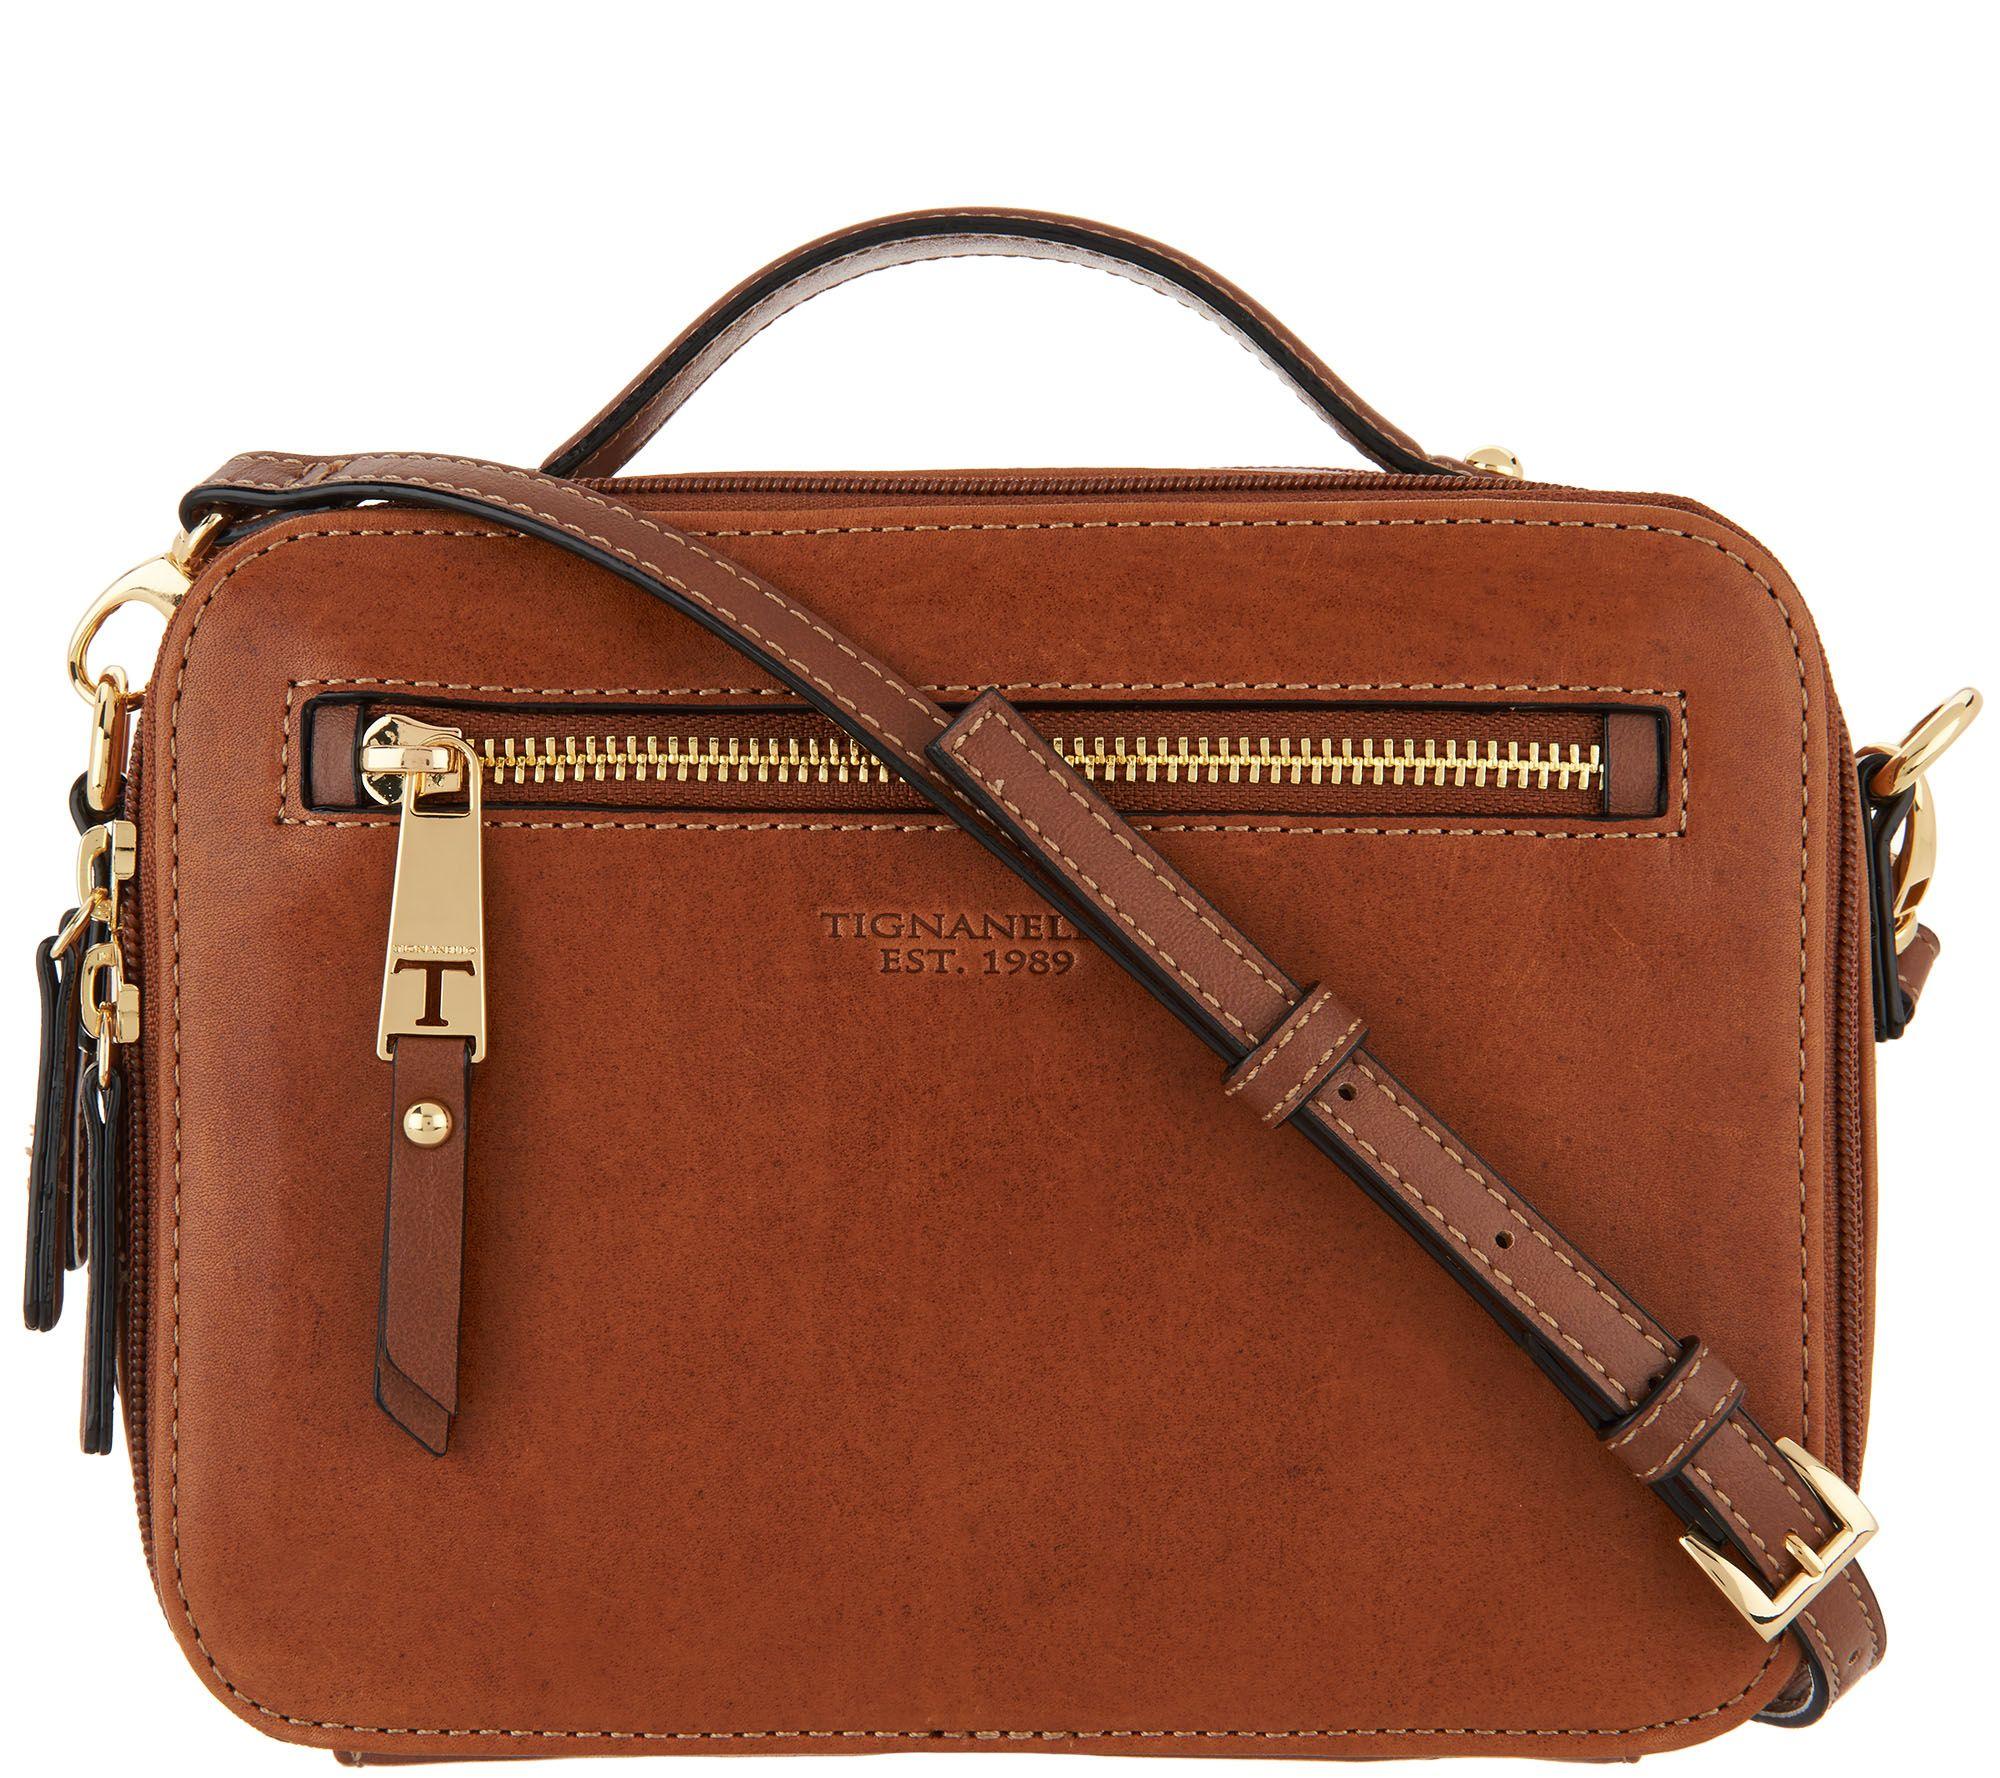 362a1a408 Tignanello Vintage Leather Camera Crossbody Bag - Atlantis - Page 1 —  QVC.com